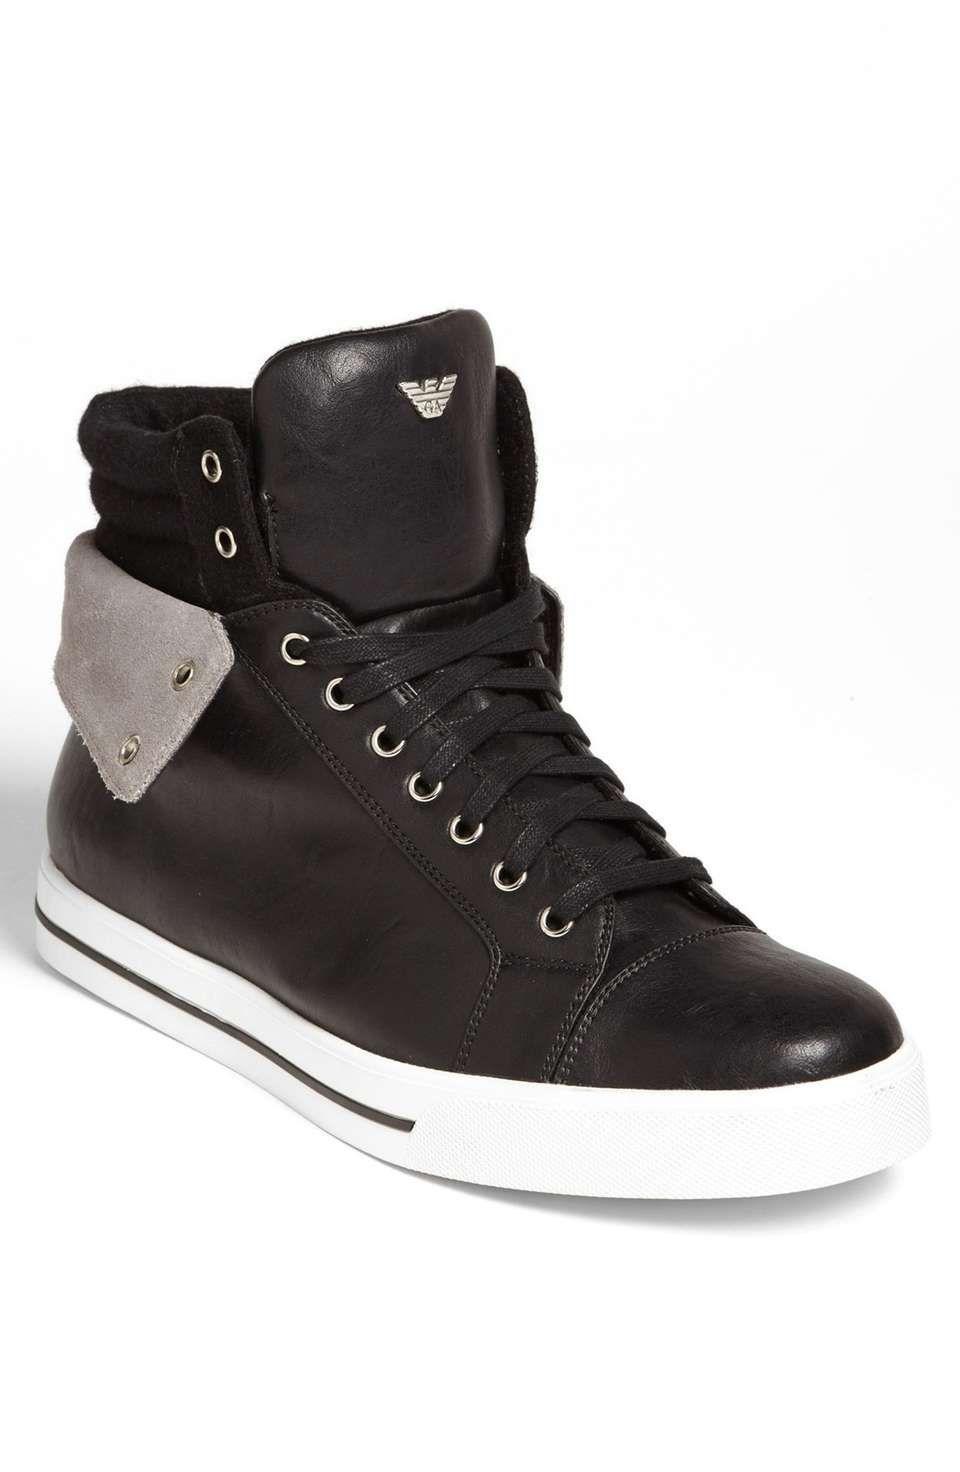 Giorgio Armani Mens Shoes